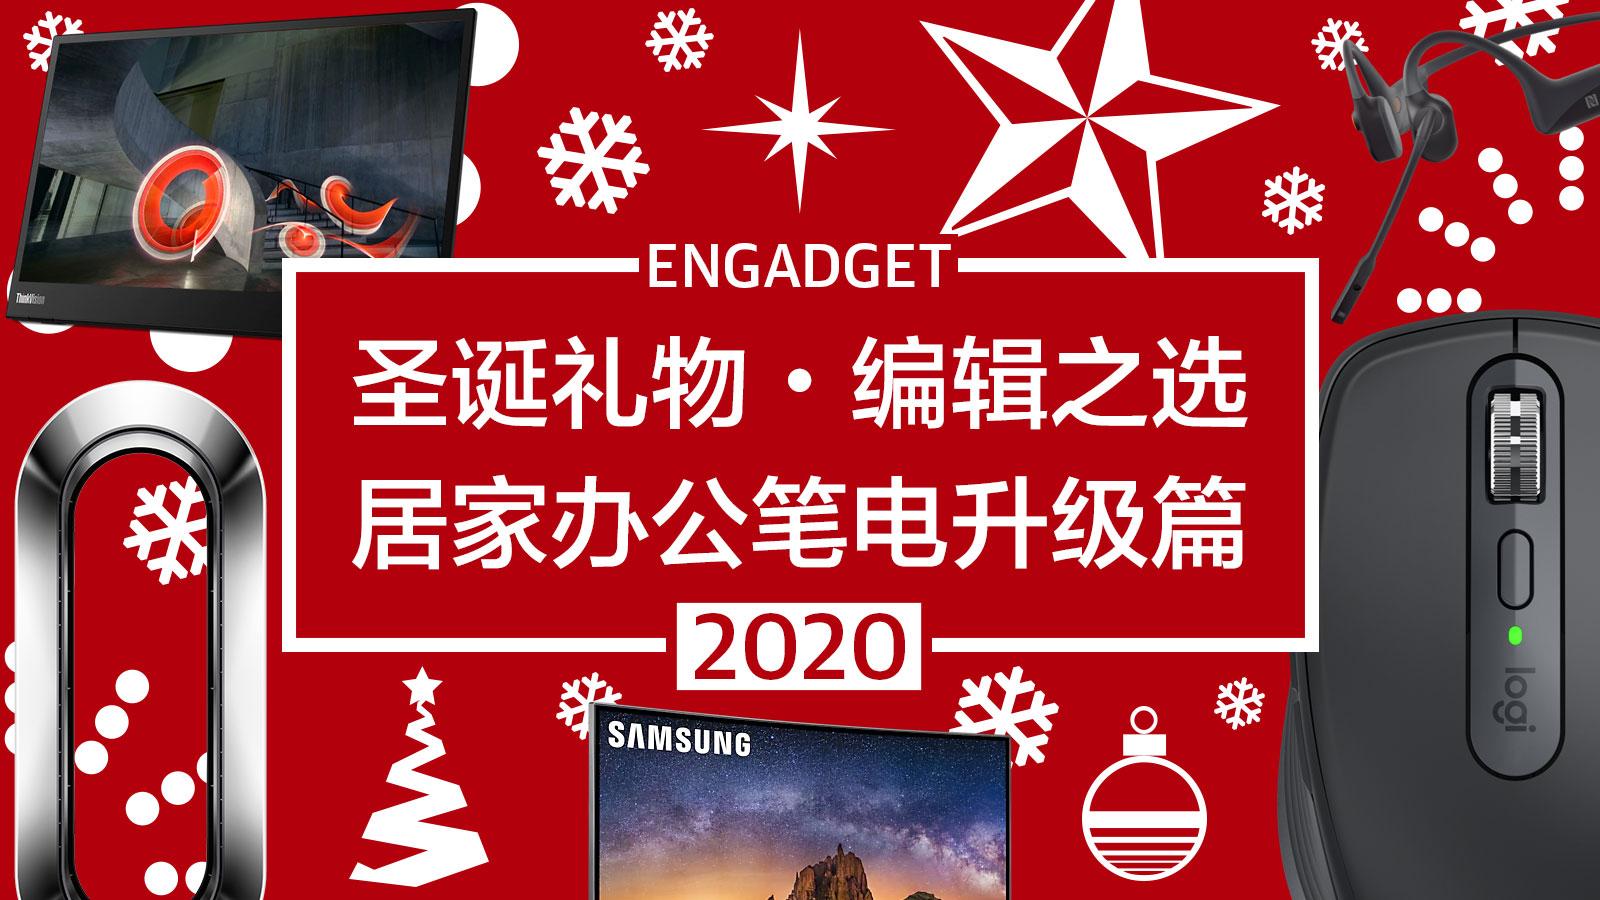 Engadget 聖誕禮物編輯之選:居家辦公筆電升級篇